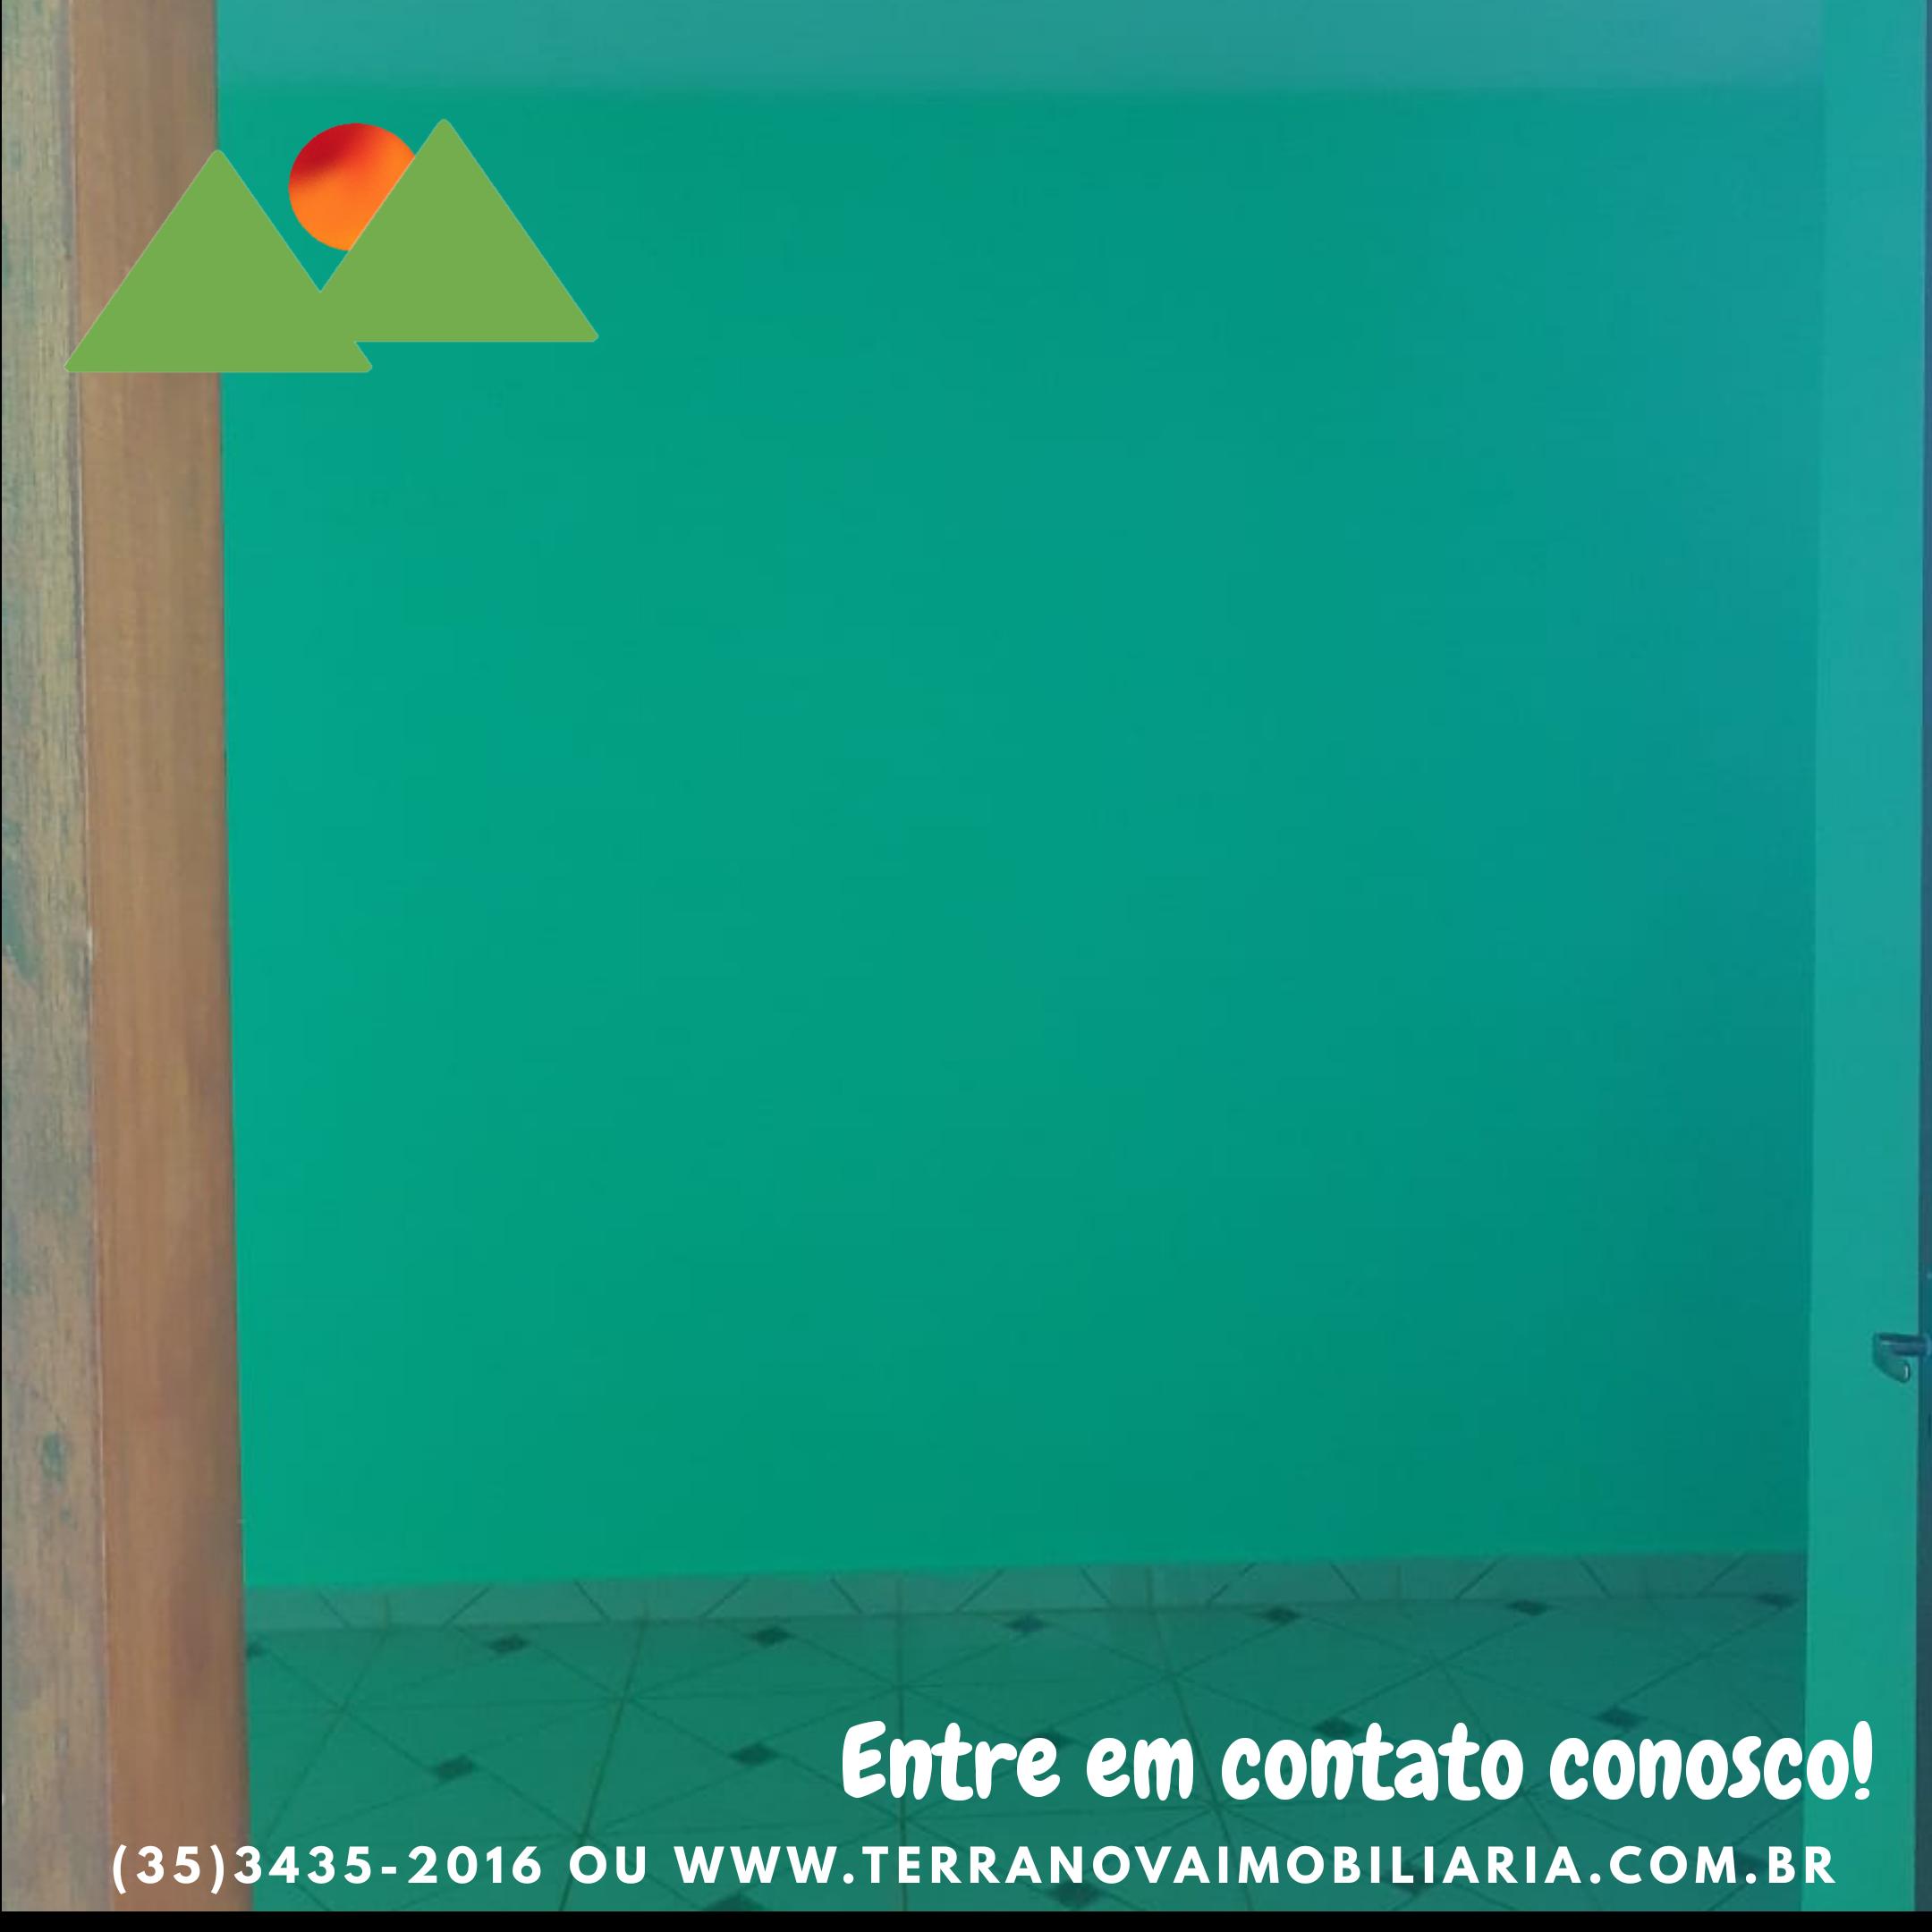 20201229_121218_0002